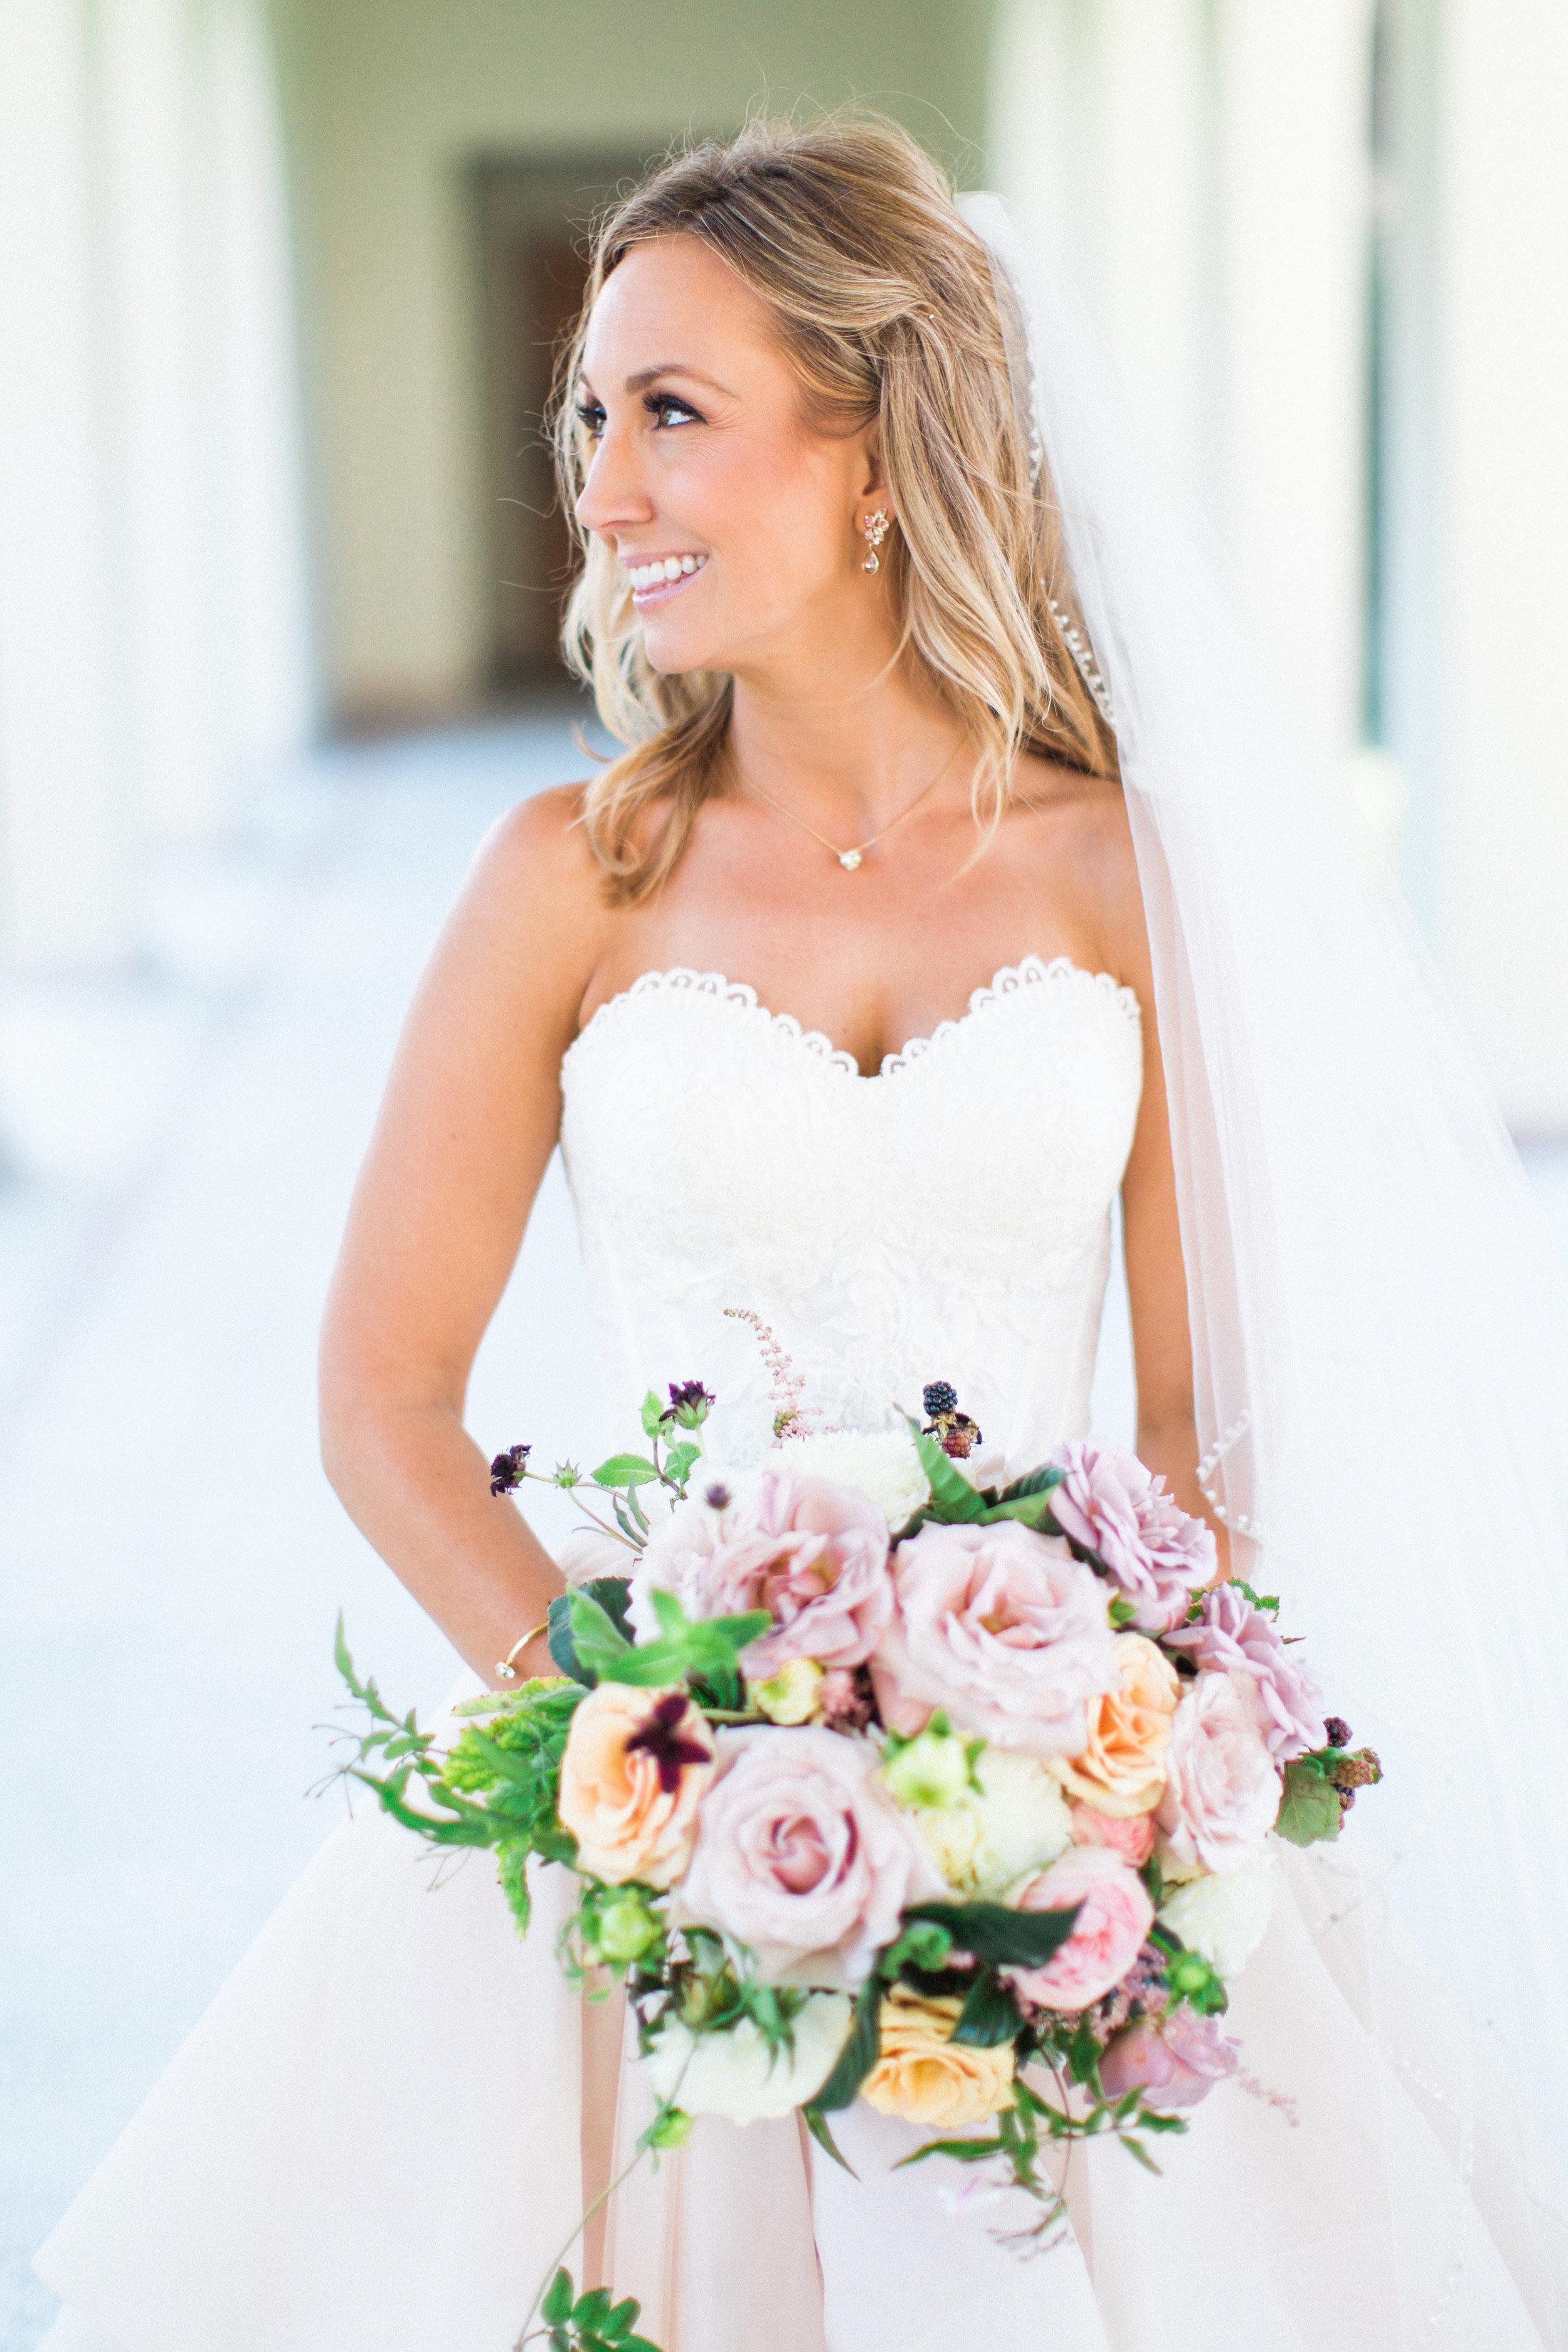 Blooms-breesa-lee-luxury-florist-aga-jones-tres-chic-affairs-san-diego-wedding-classic-coast-catering-(45).jpg